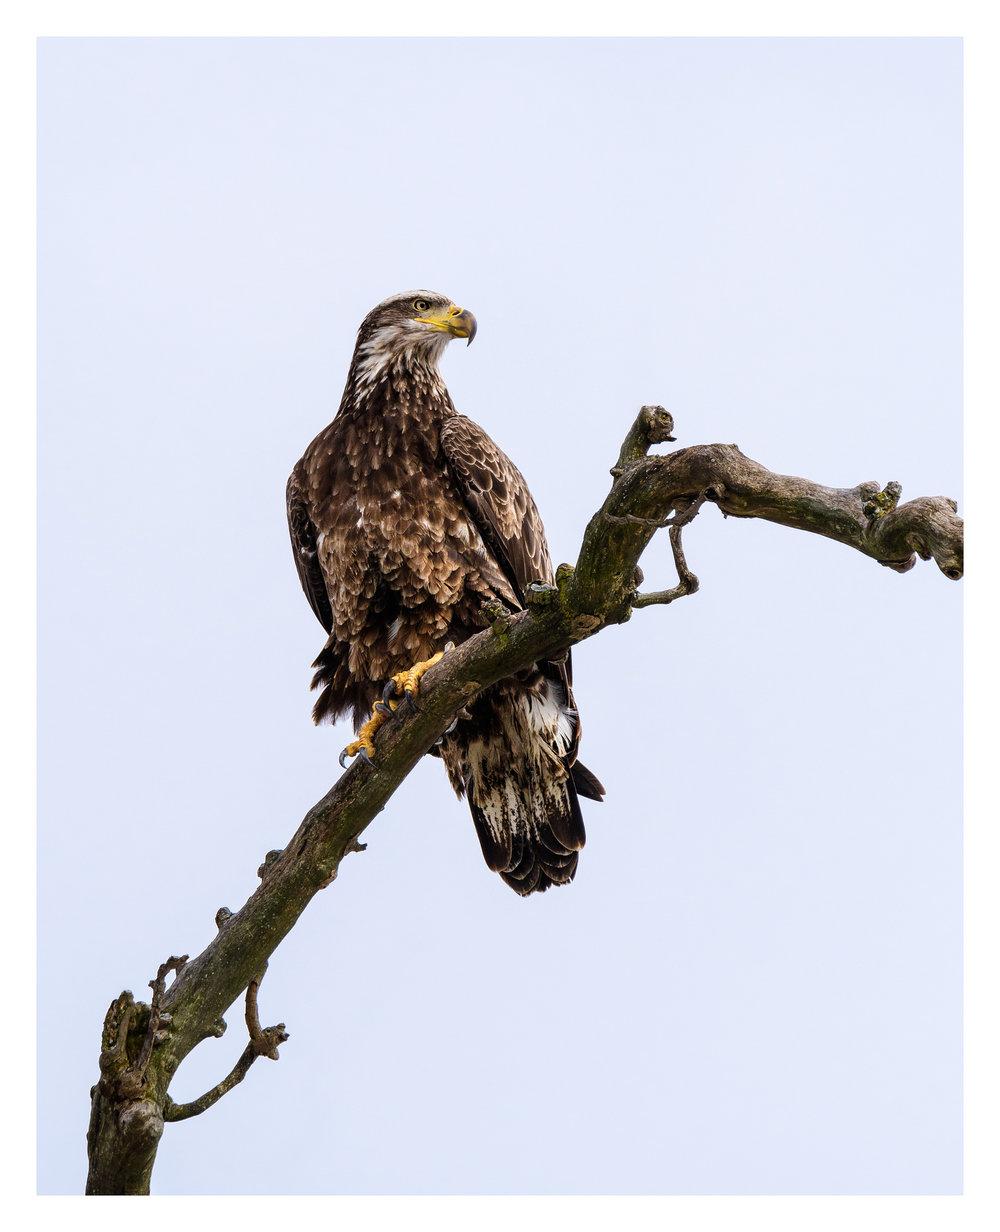 Juvenile Bald Eagle - Nikon D500 w/Tamron 150-600mm lens